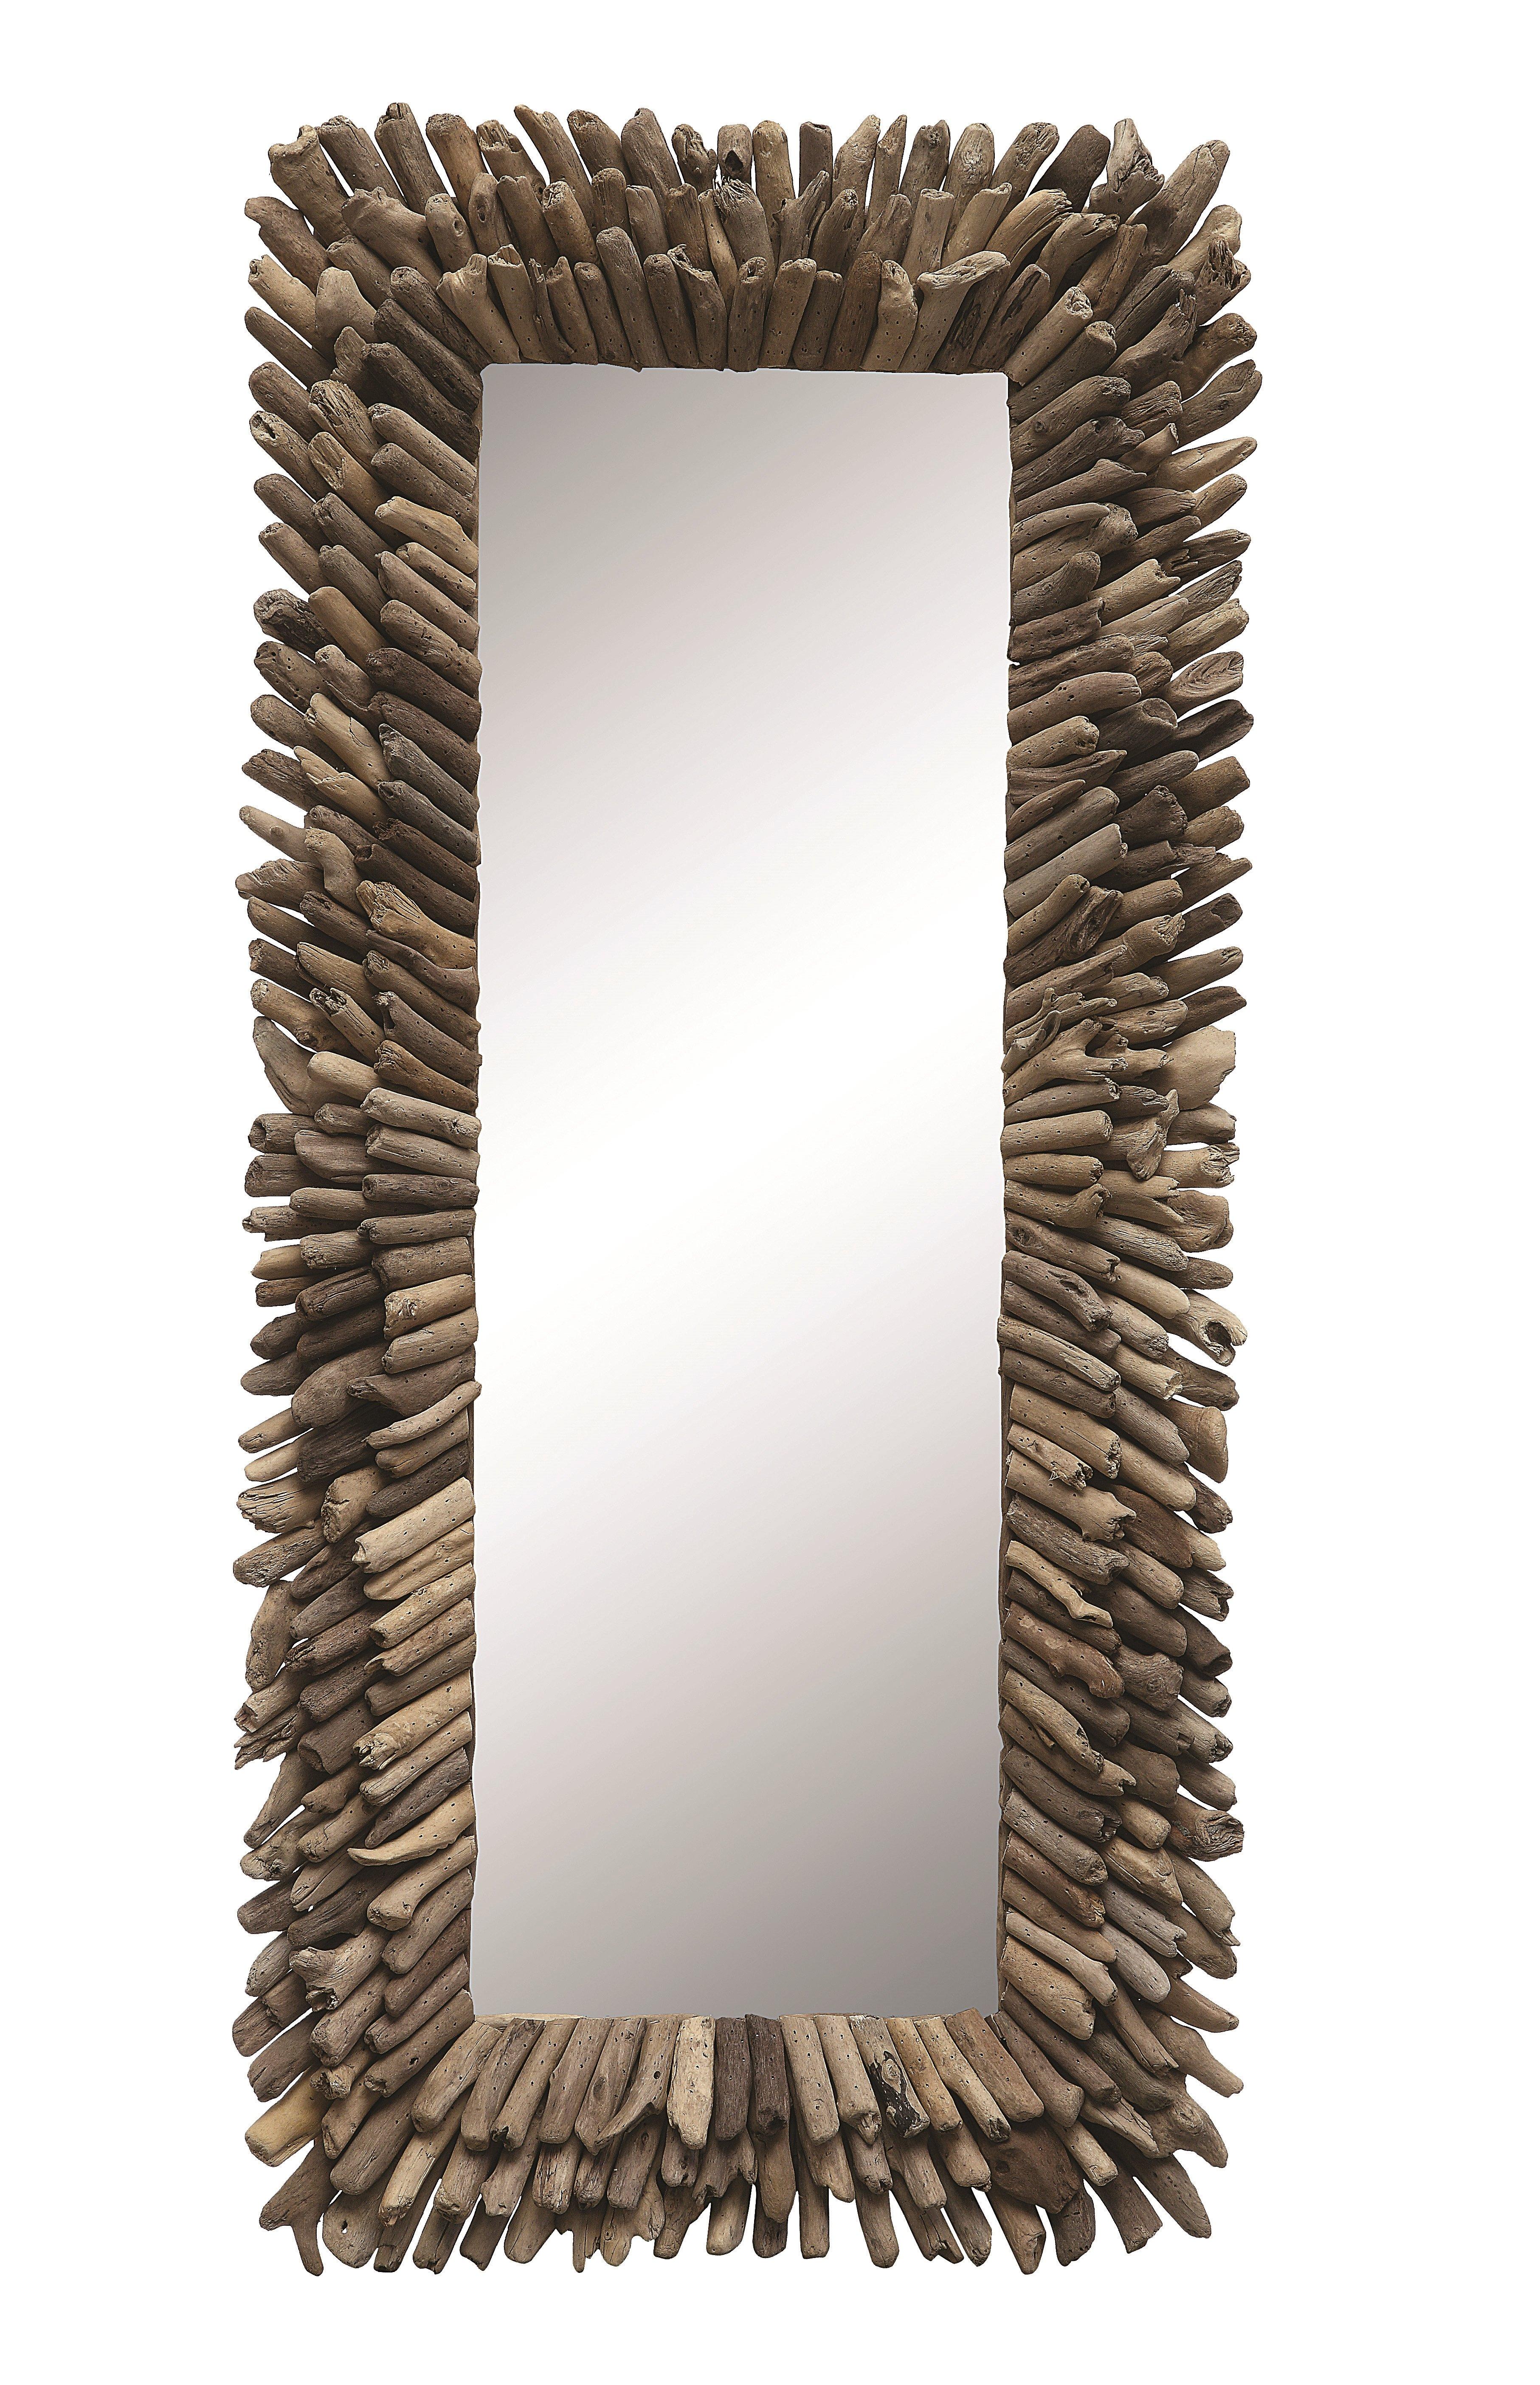 Kellett Accent Mirror Within Perillo Burst Wood Accent Mirrors (View 9 of 20)